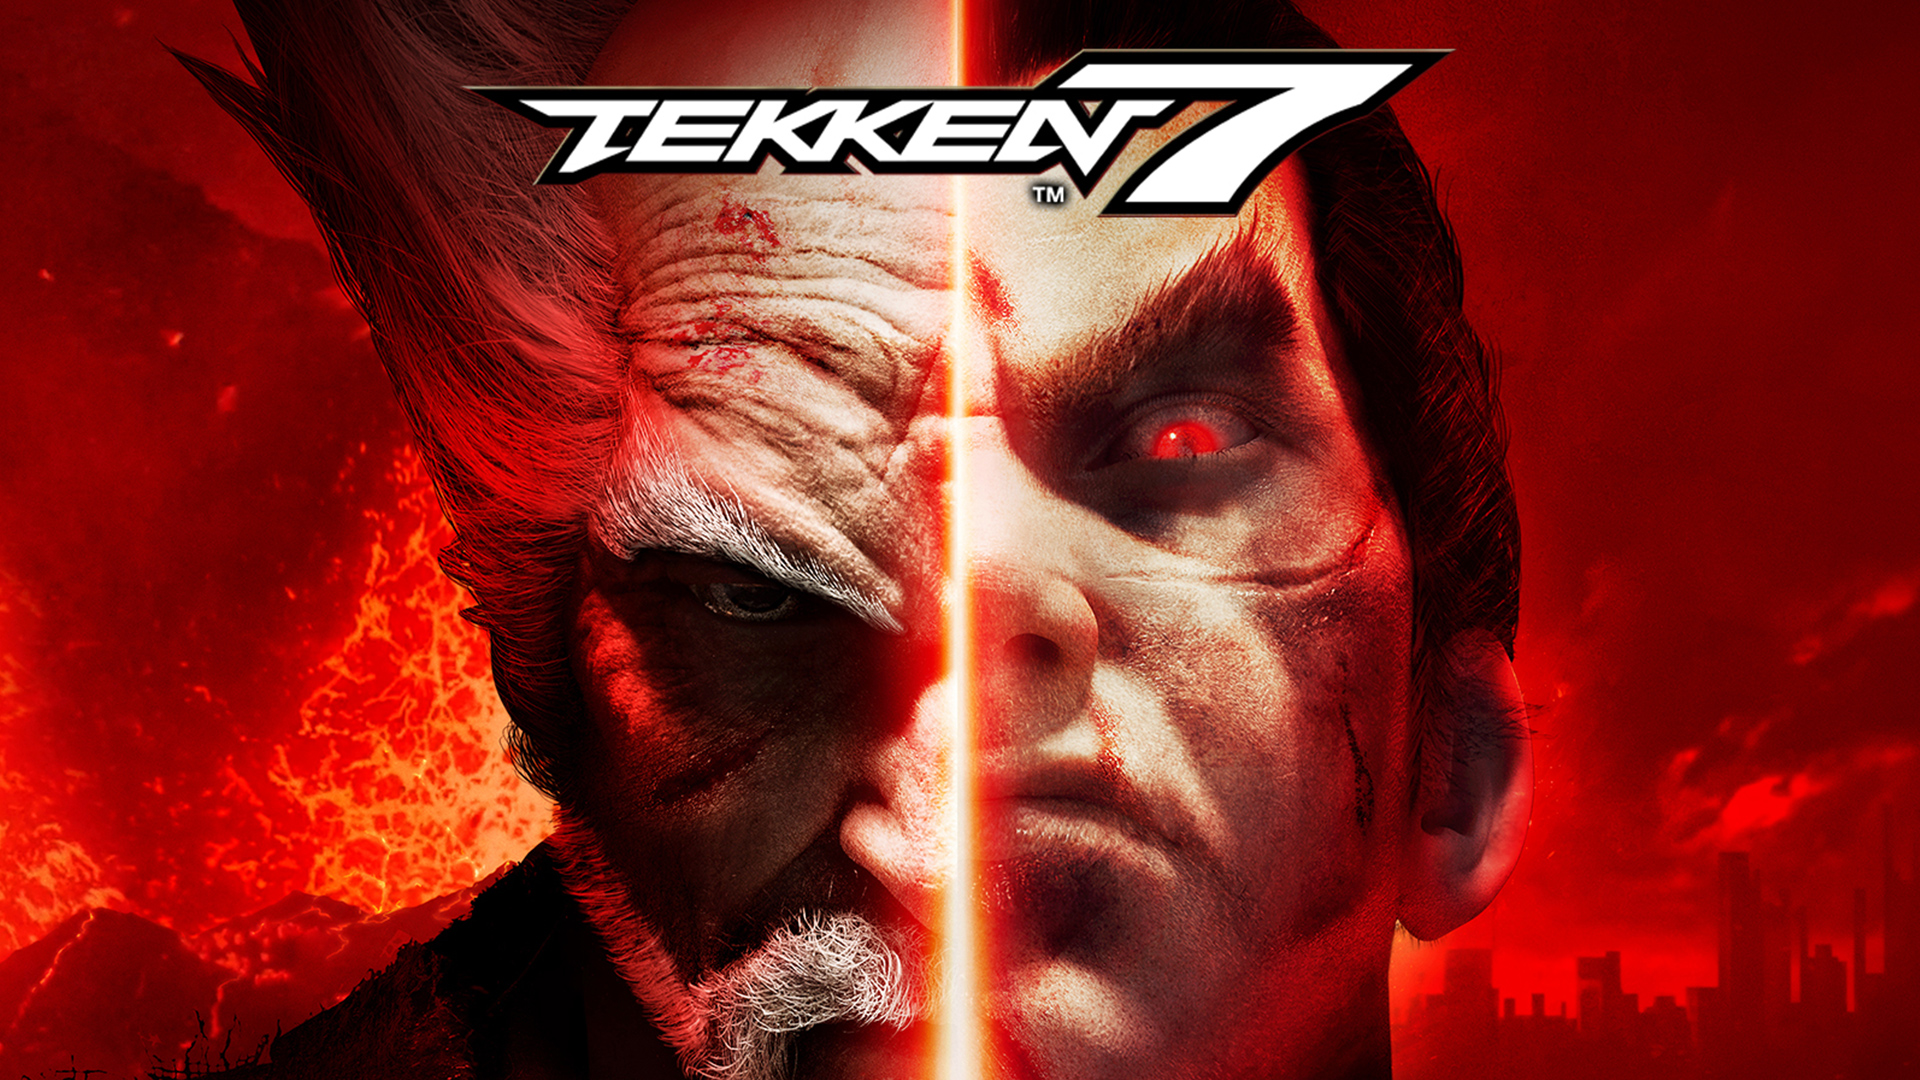 Tekken 7 do zgarnięcia za bezcen. Świetna promocja na gry Bandai Namco